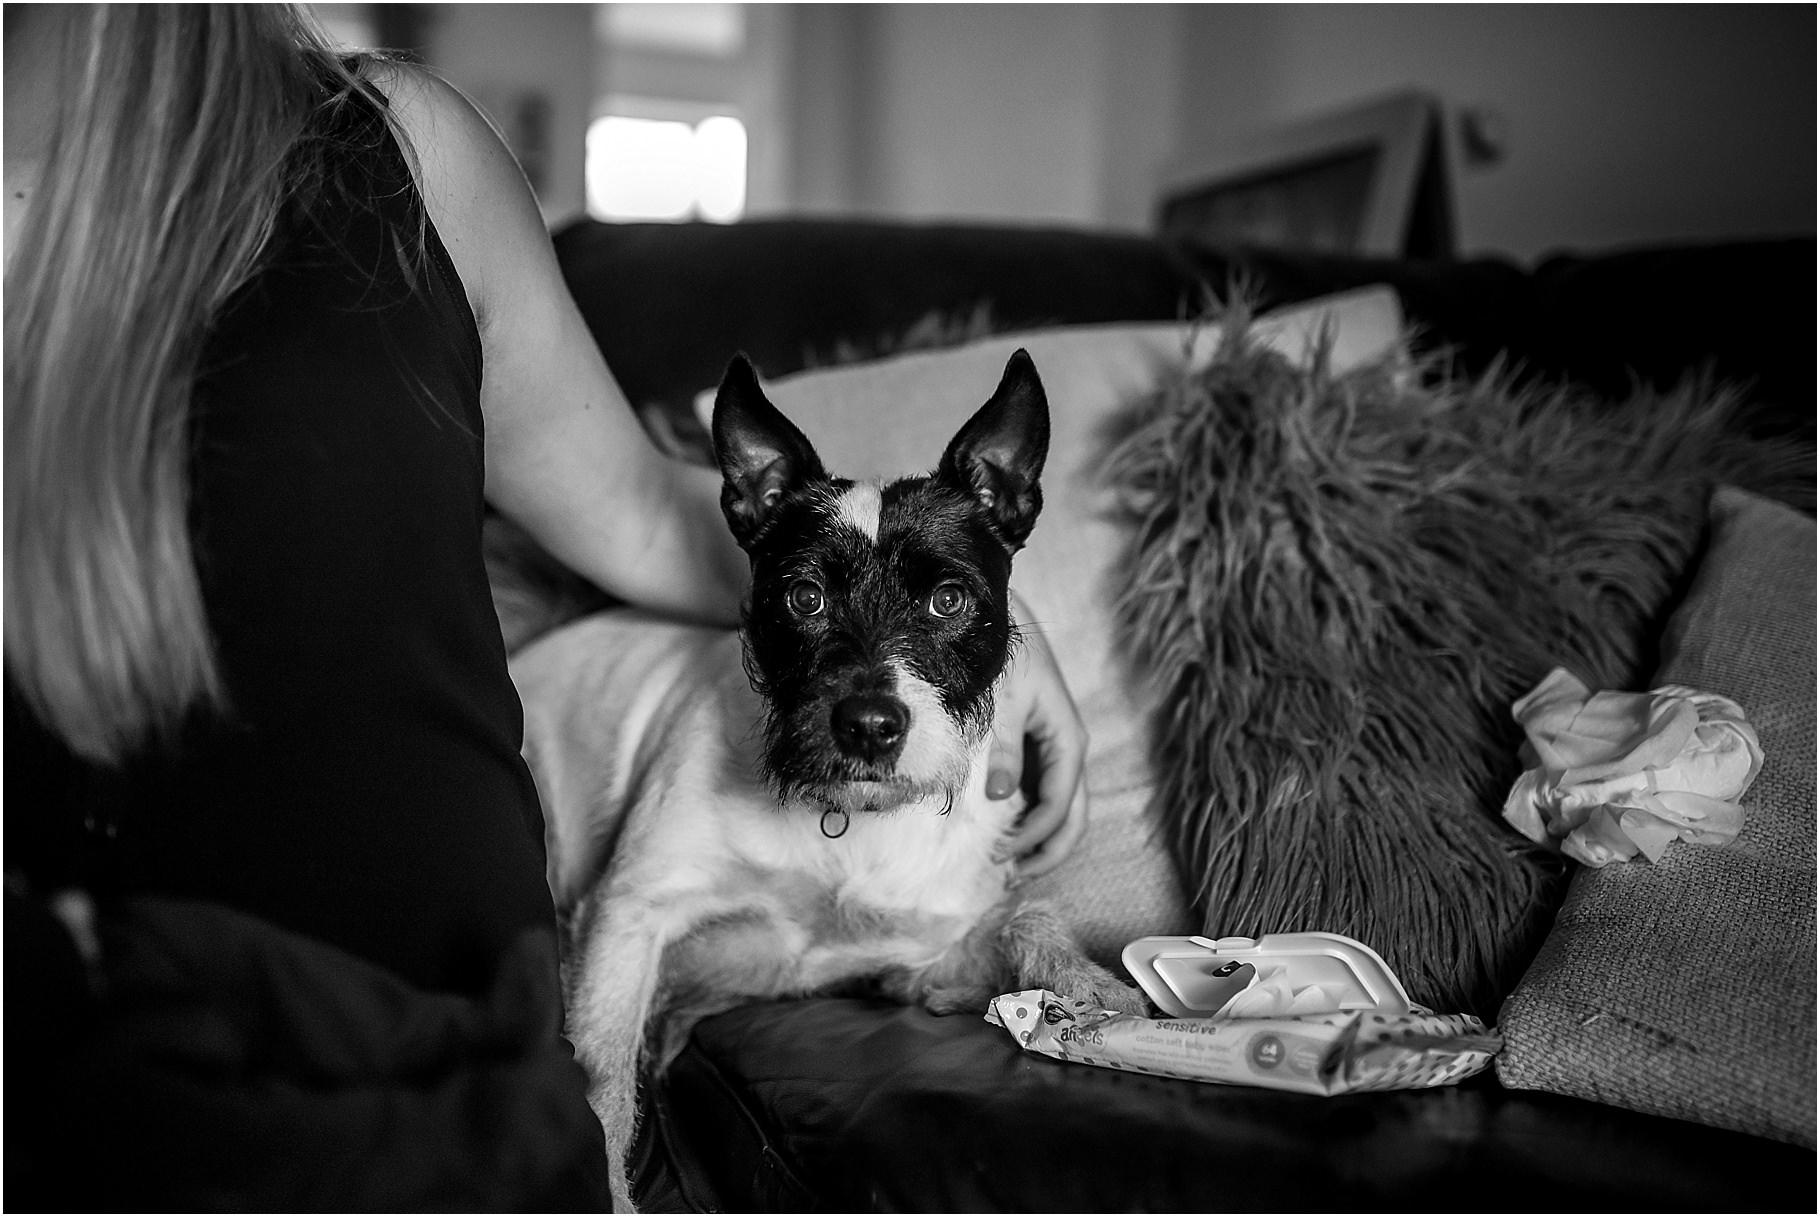 lancashire-family-portraits-documentary-newborn-17.jpg